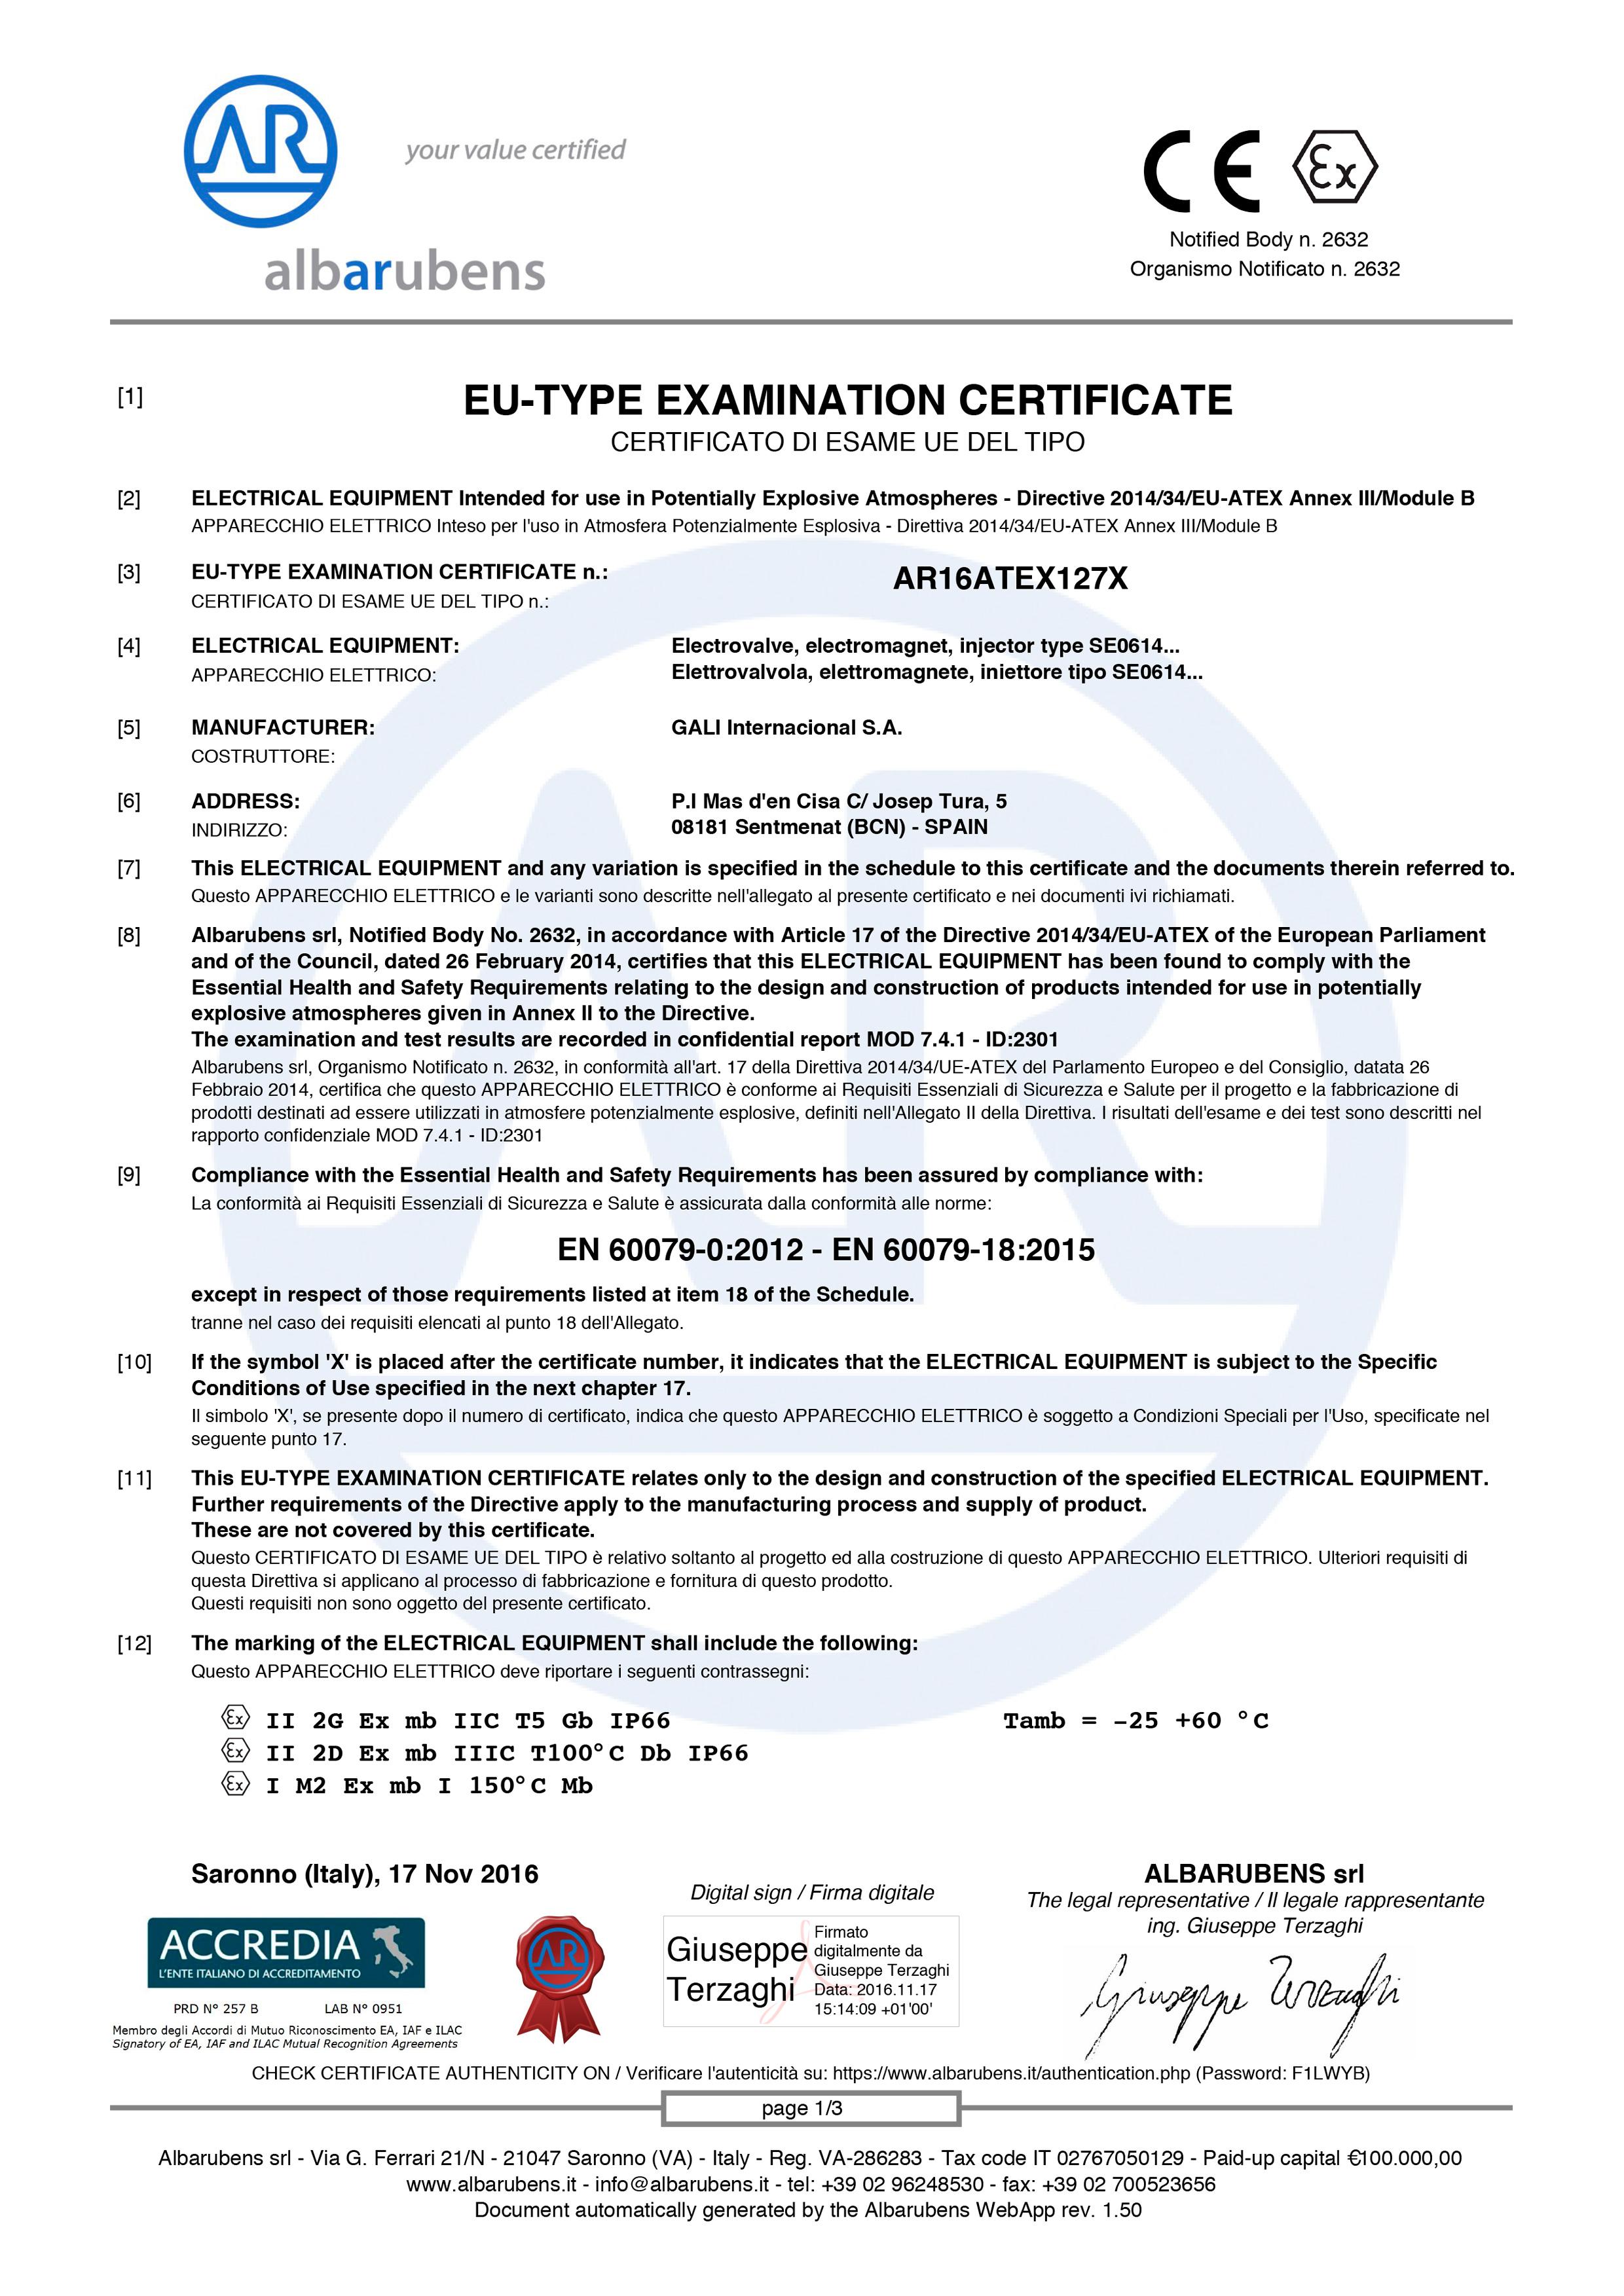 AR16ATEX127X certificate